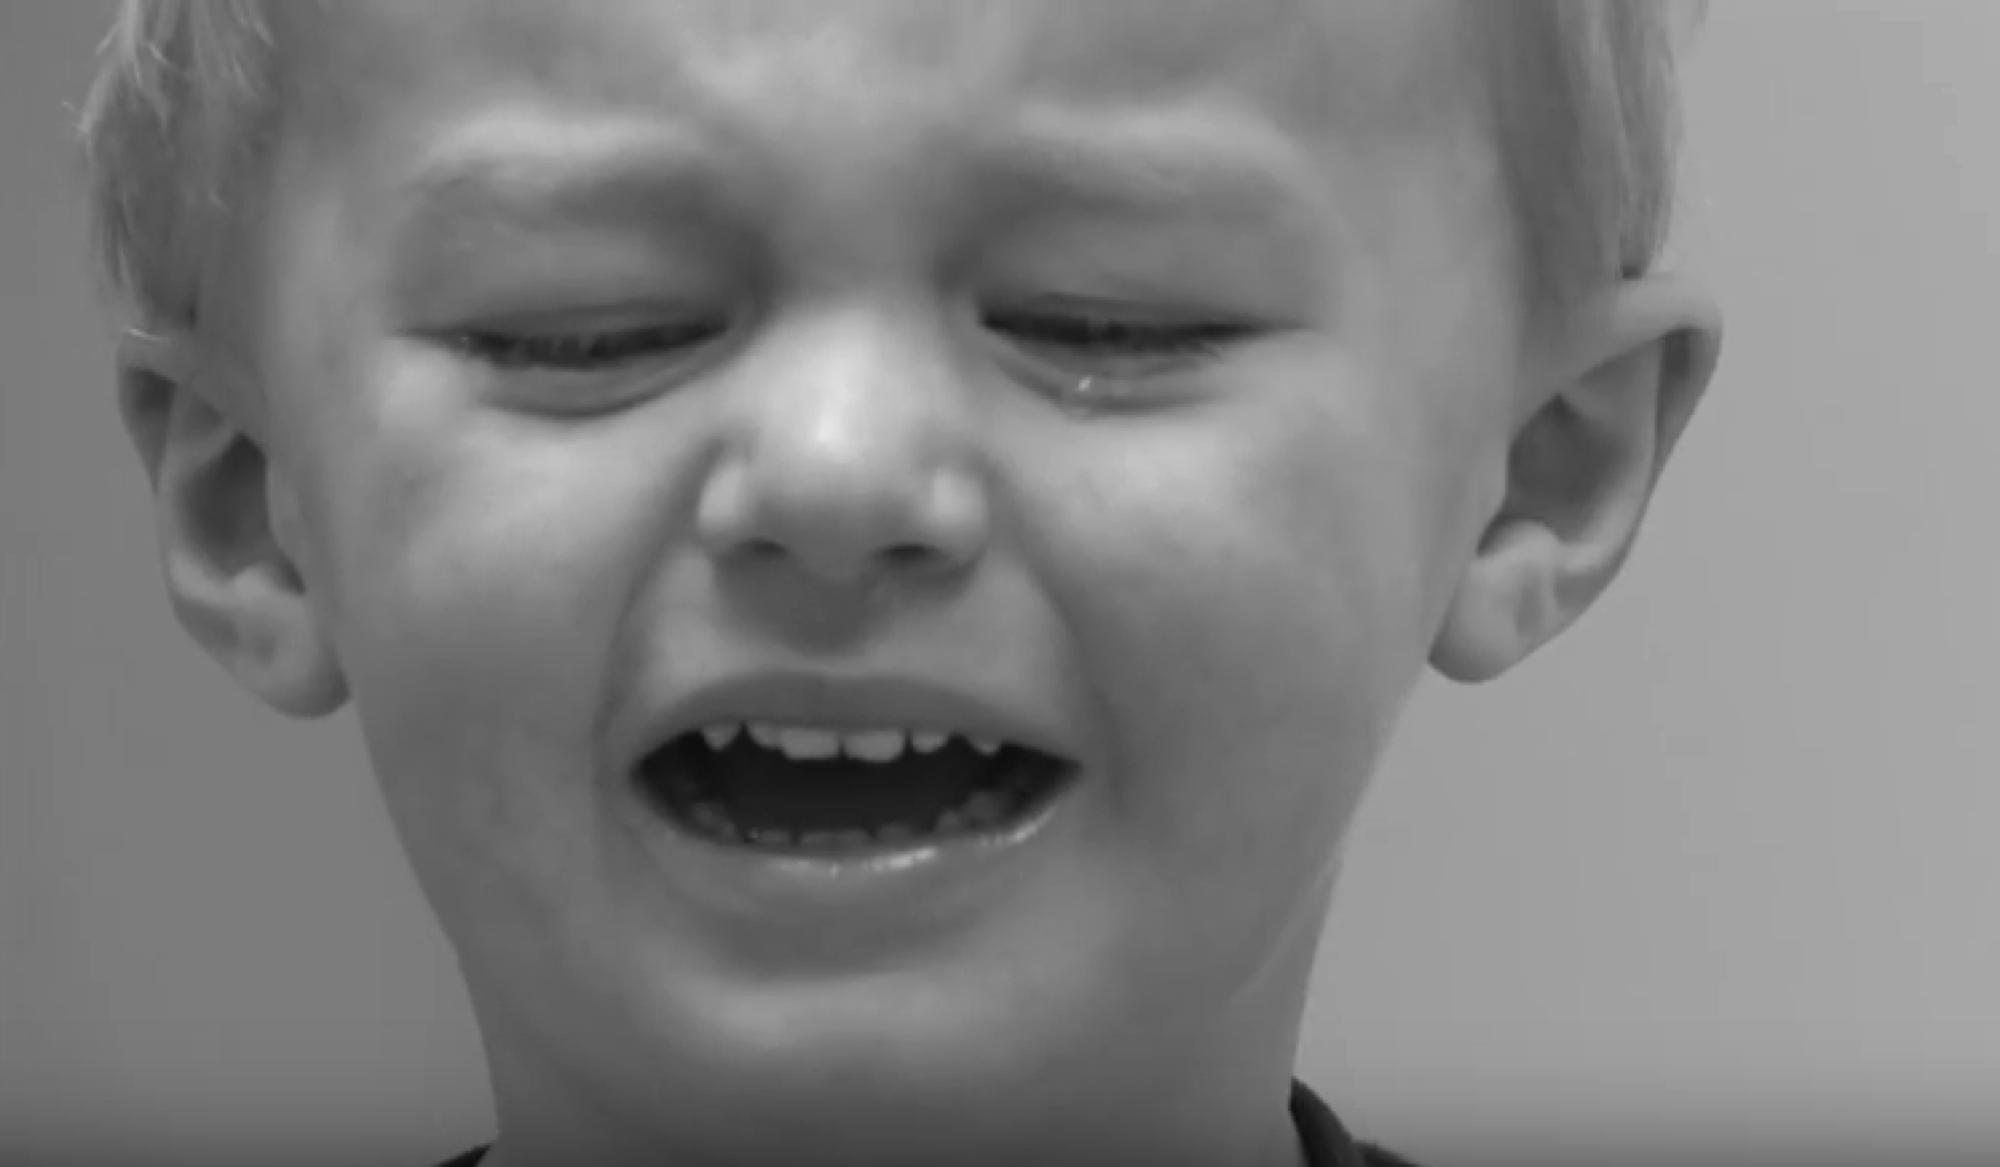 Are Children safe in Preschool